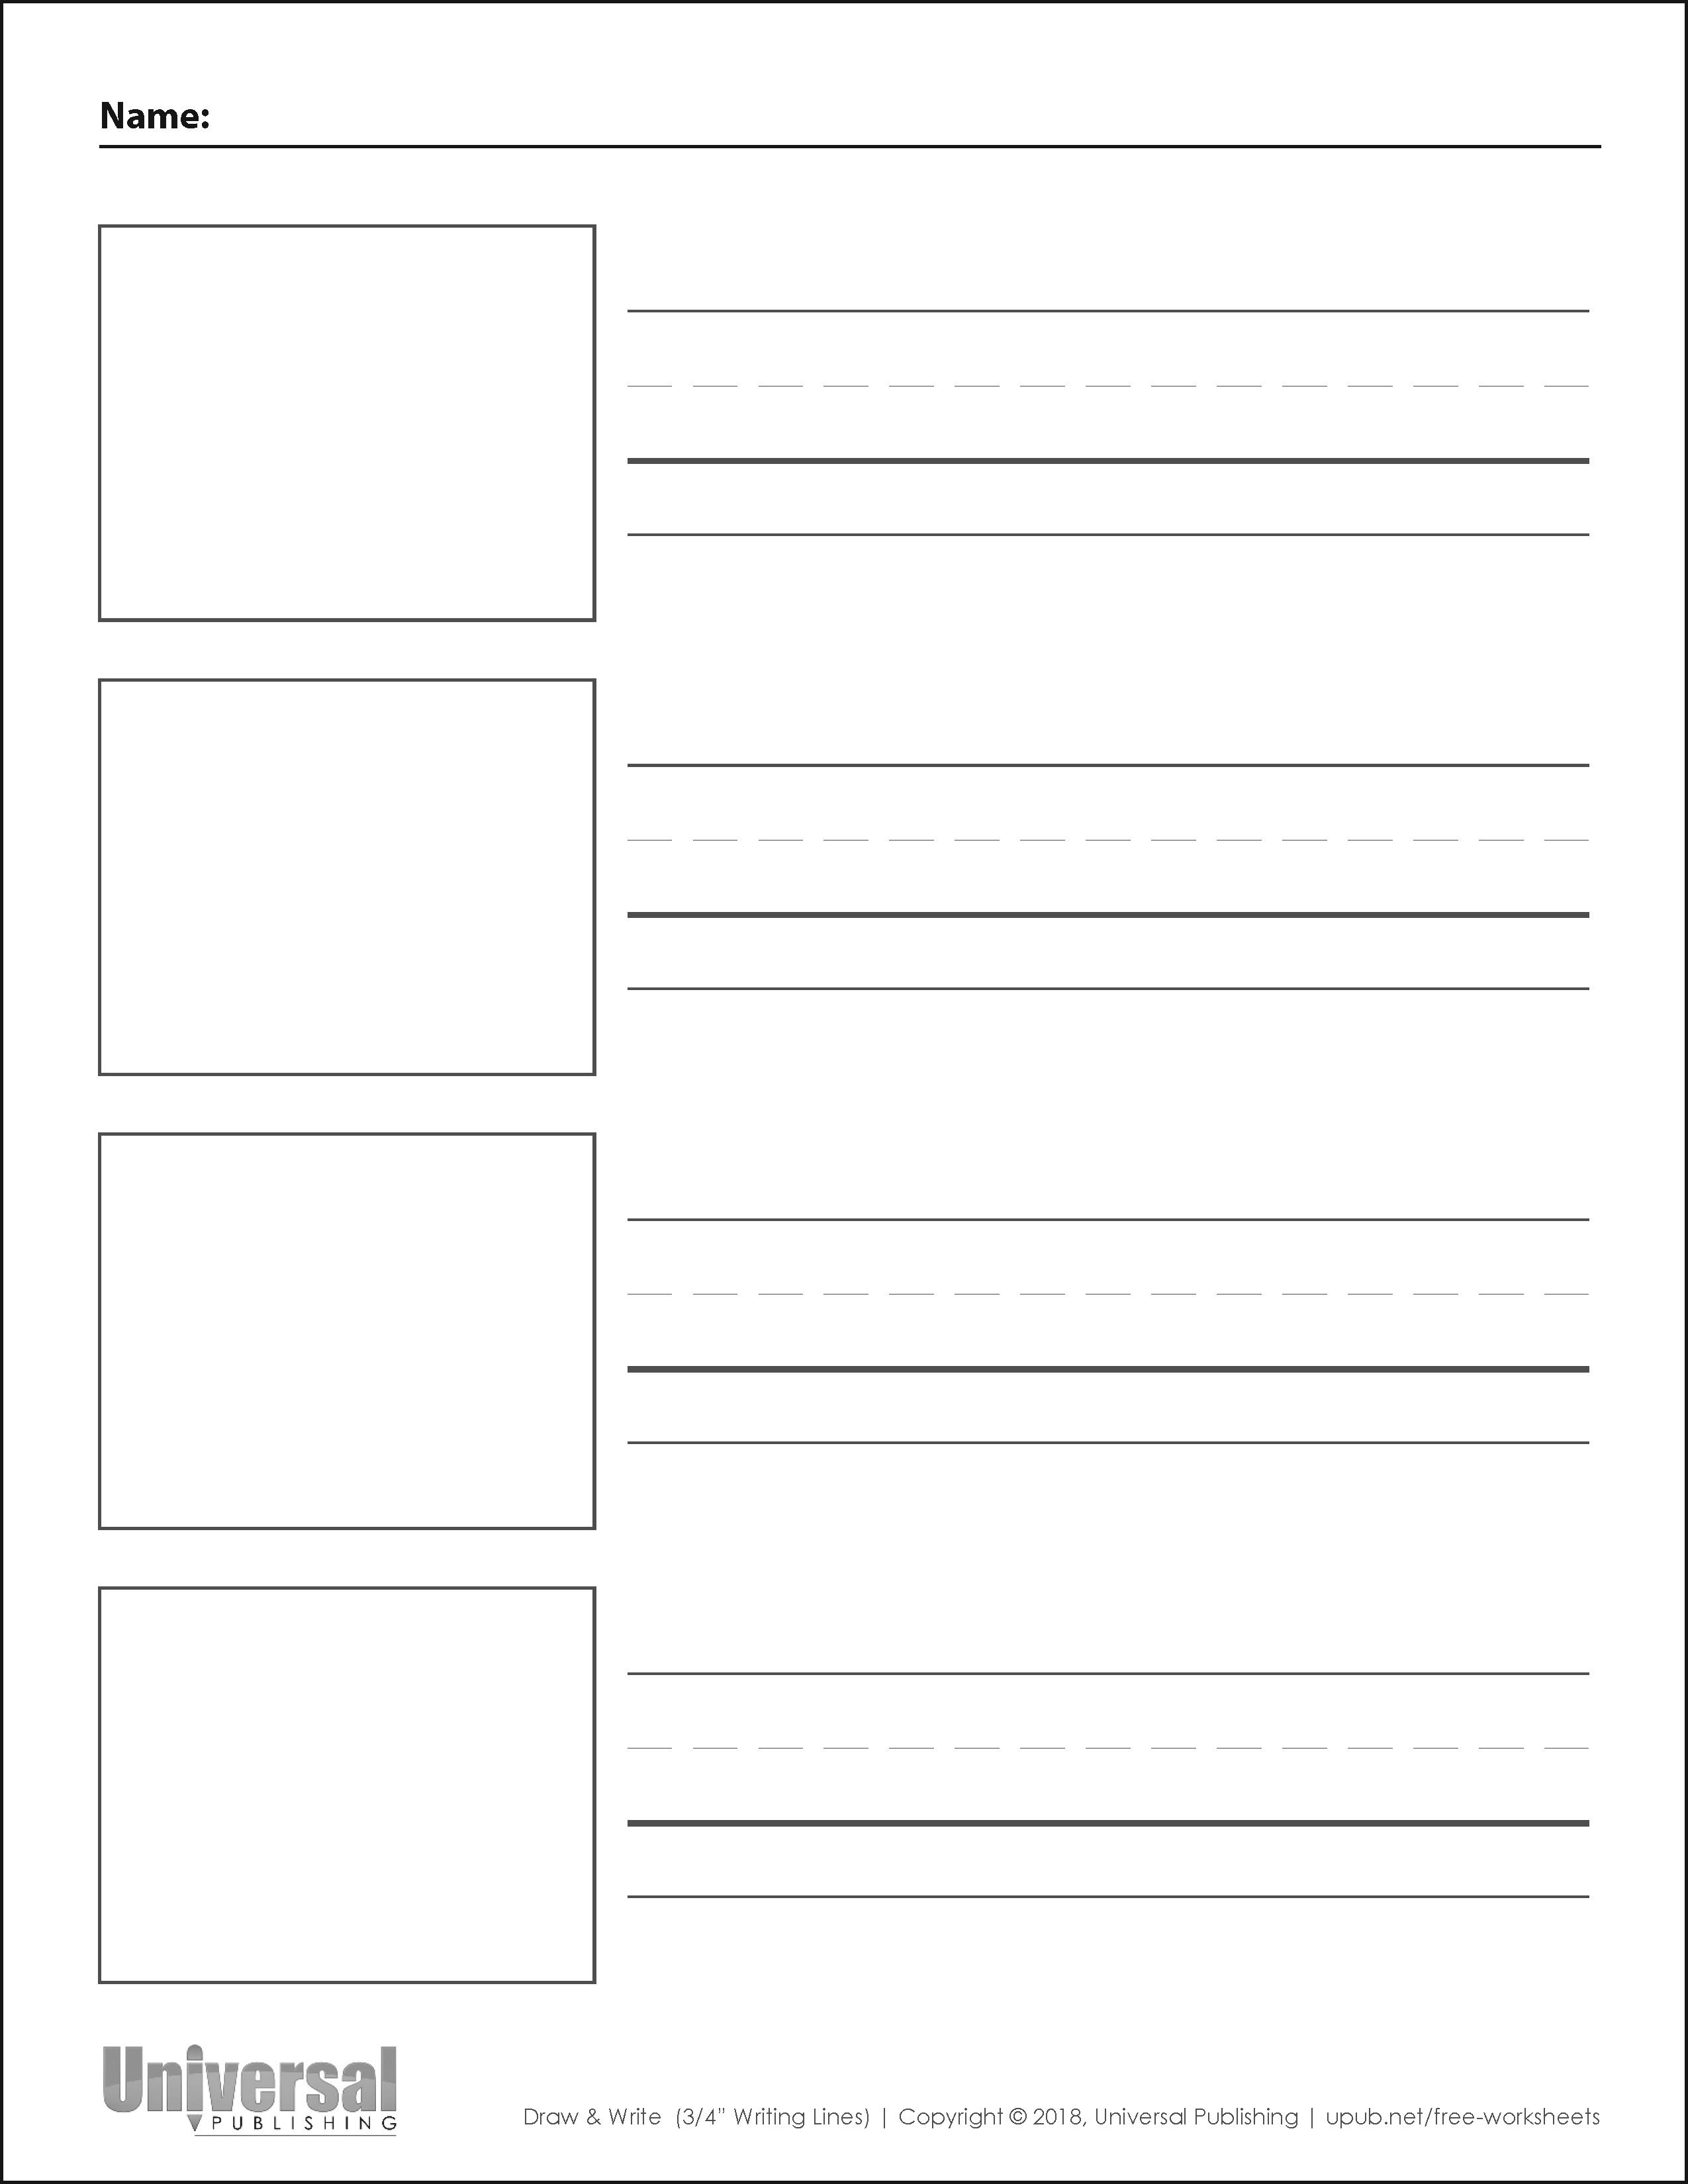 Draw Write Paper Free Printables Universal Publishing Writing Paper Printable Kindergarten Writing Paper Writing Printables Read write draw printables